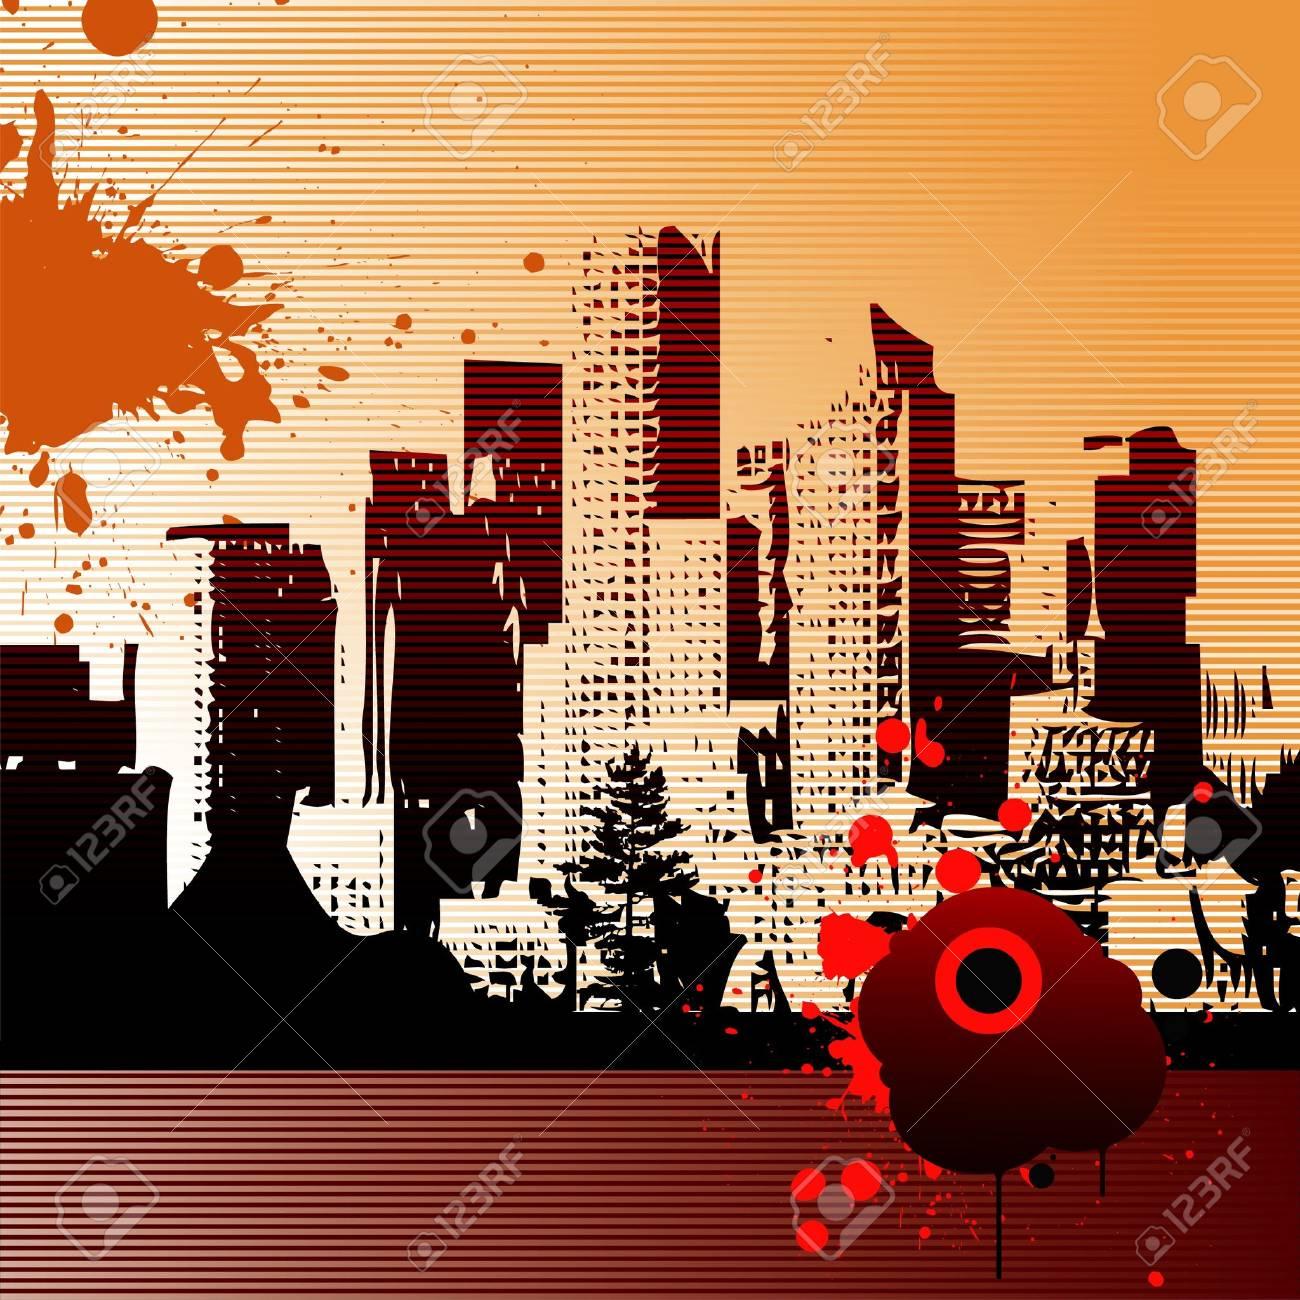 Abstract vector urban art - City landscape Stock Vector - 10909848